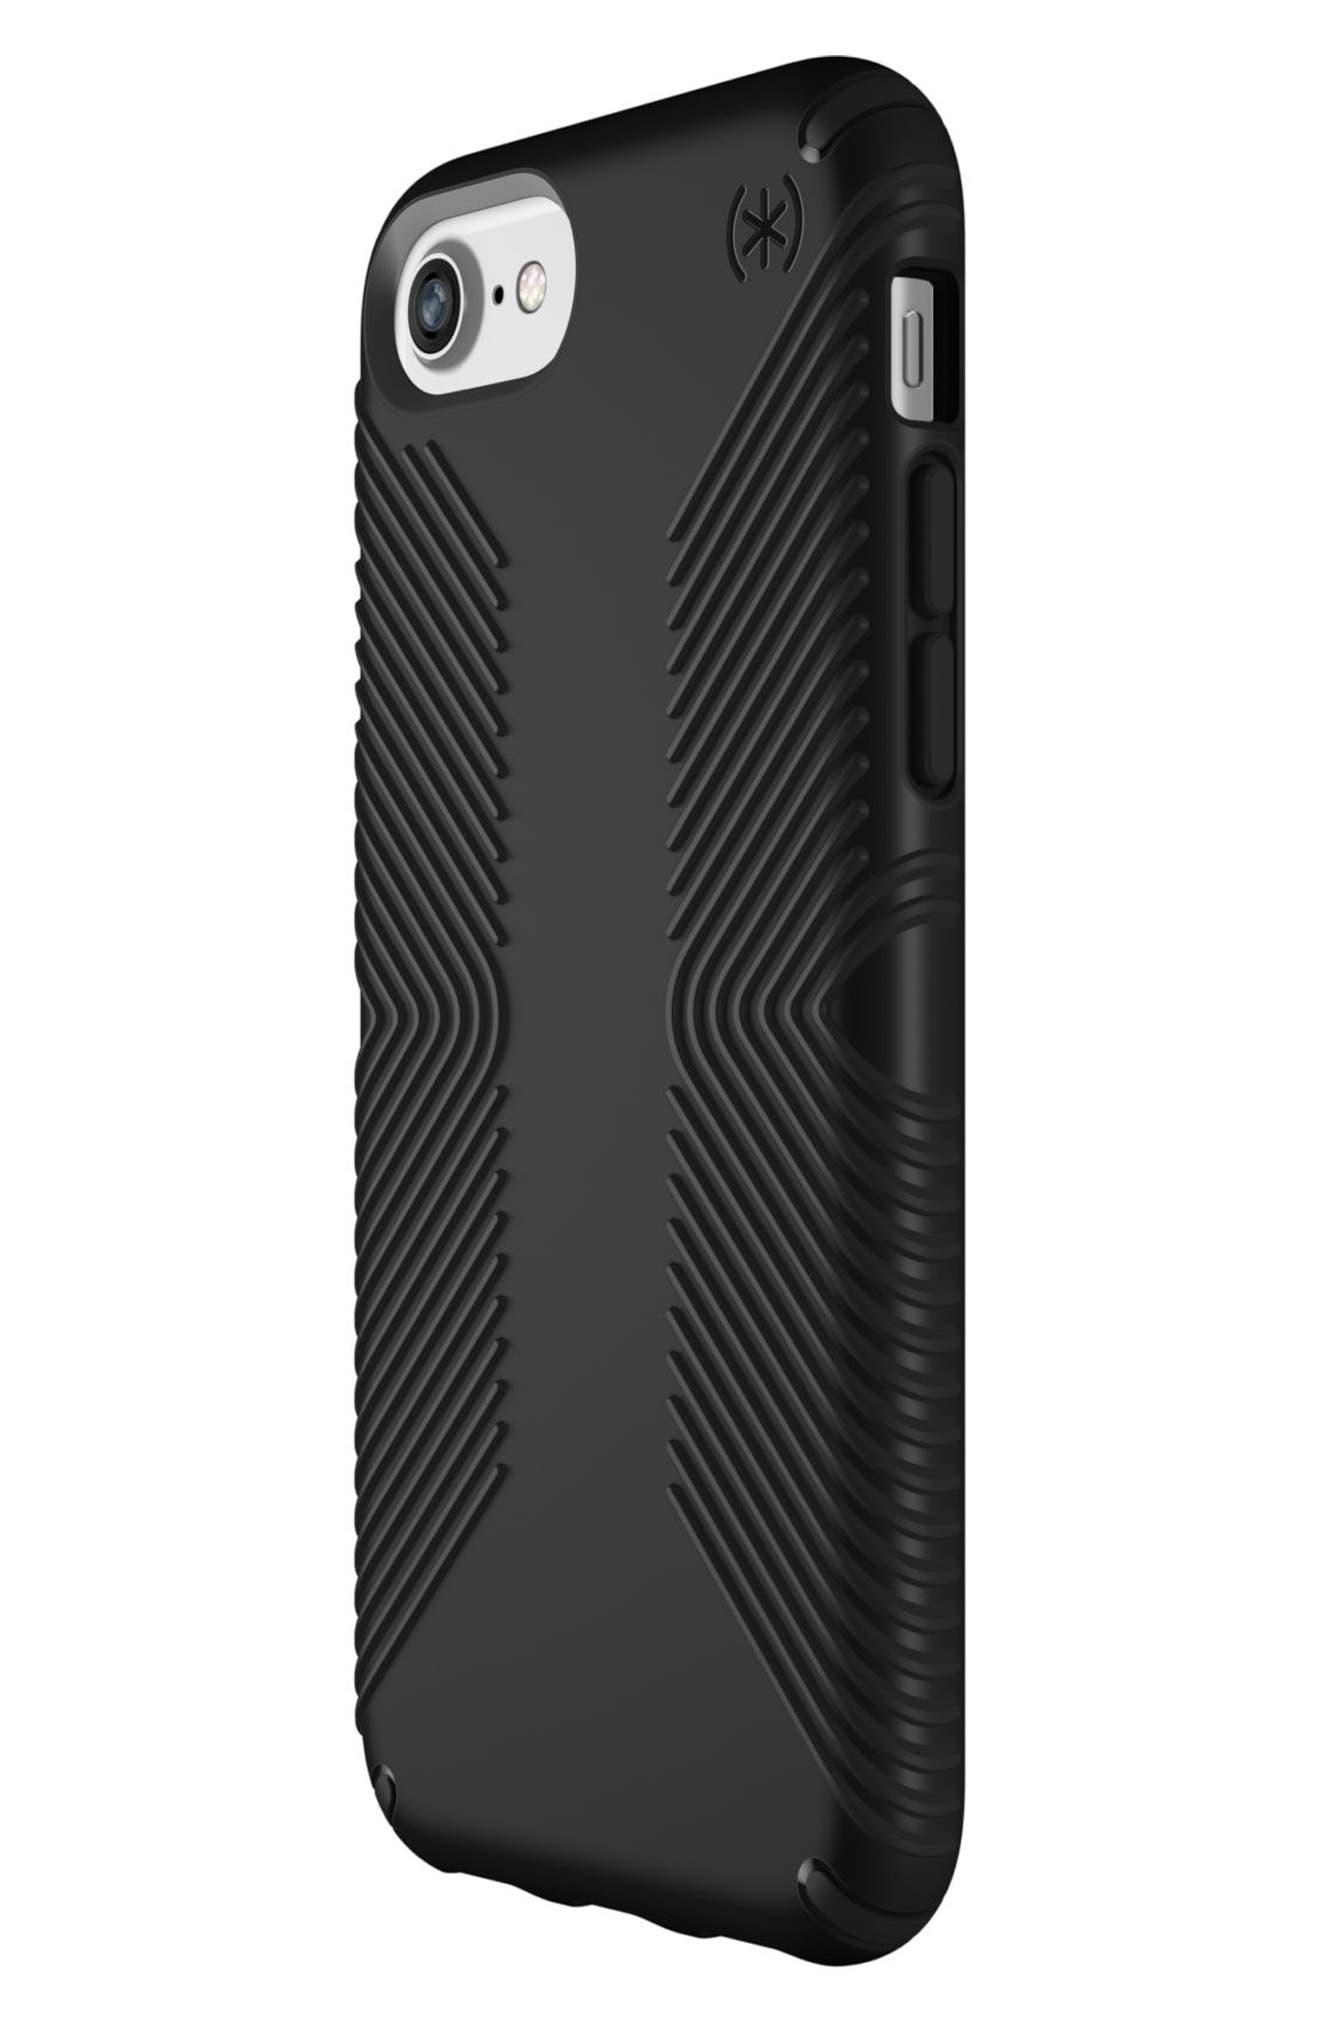 Grip iPhone 6/6s/7/8 Case,                             Alternate thumbnail 7, color,                             001